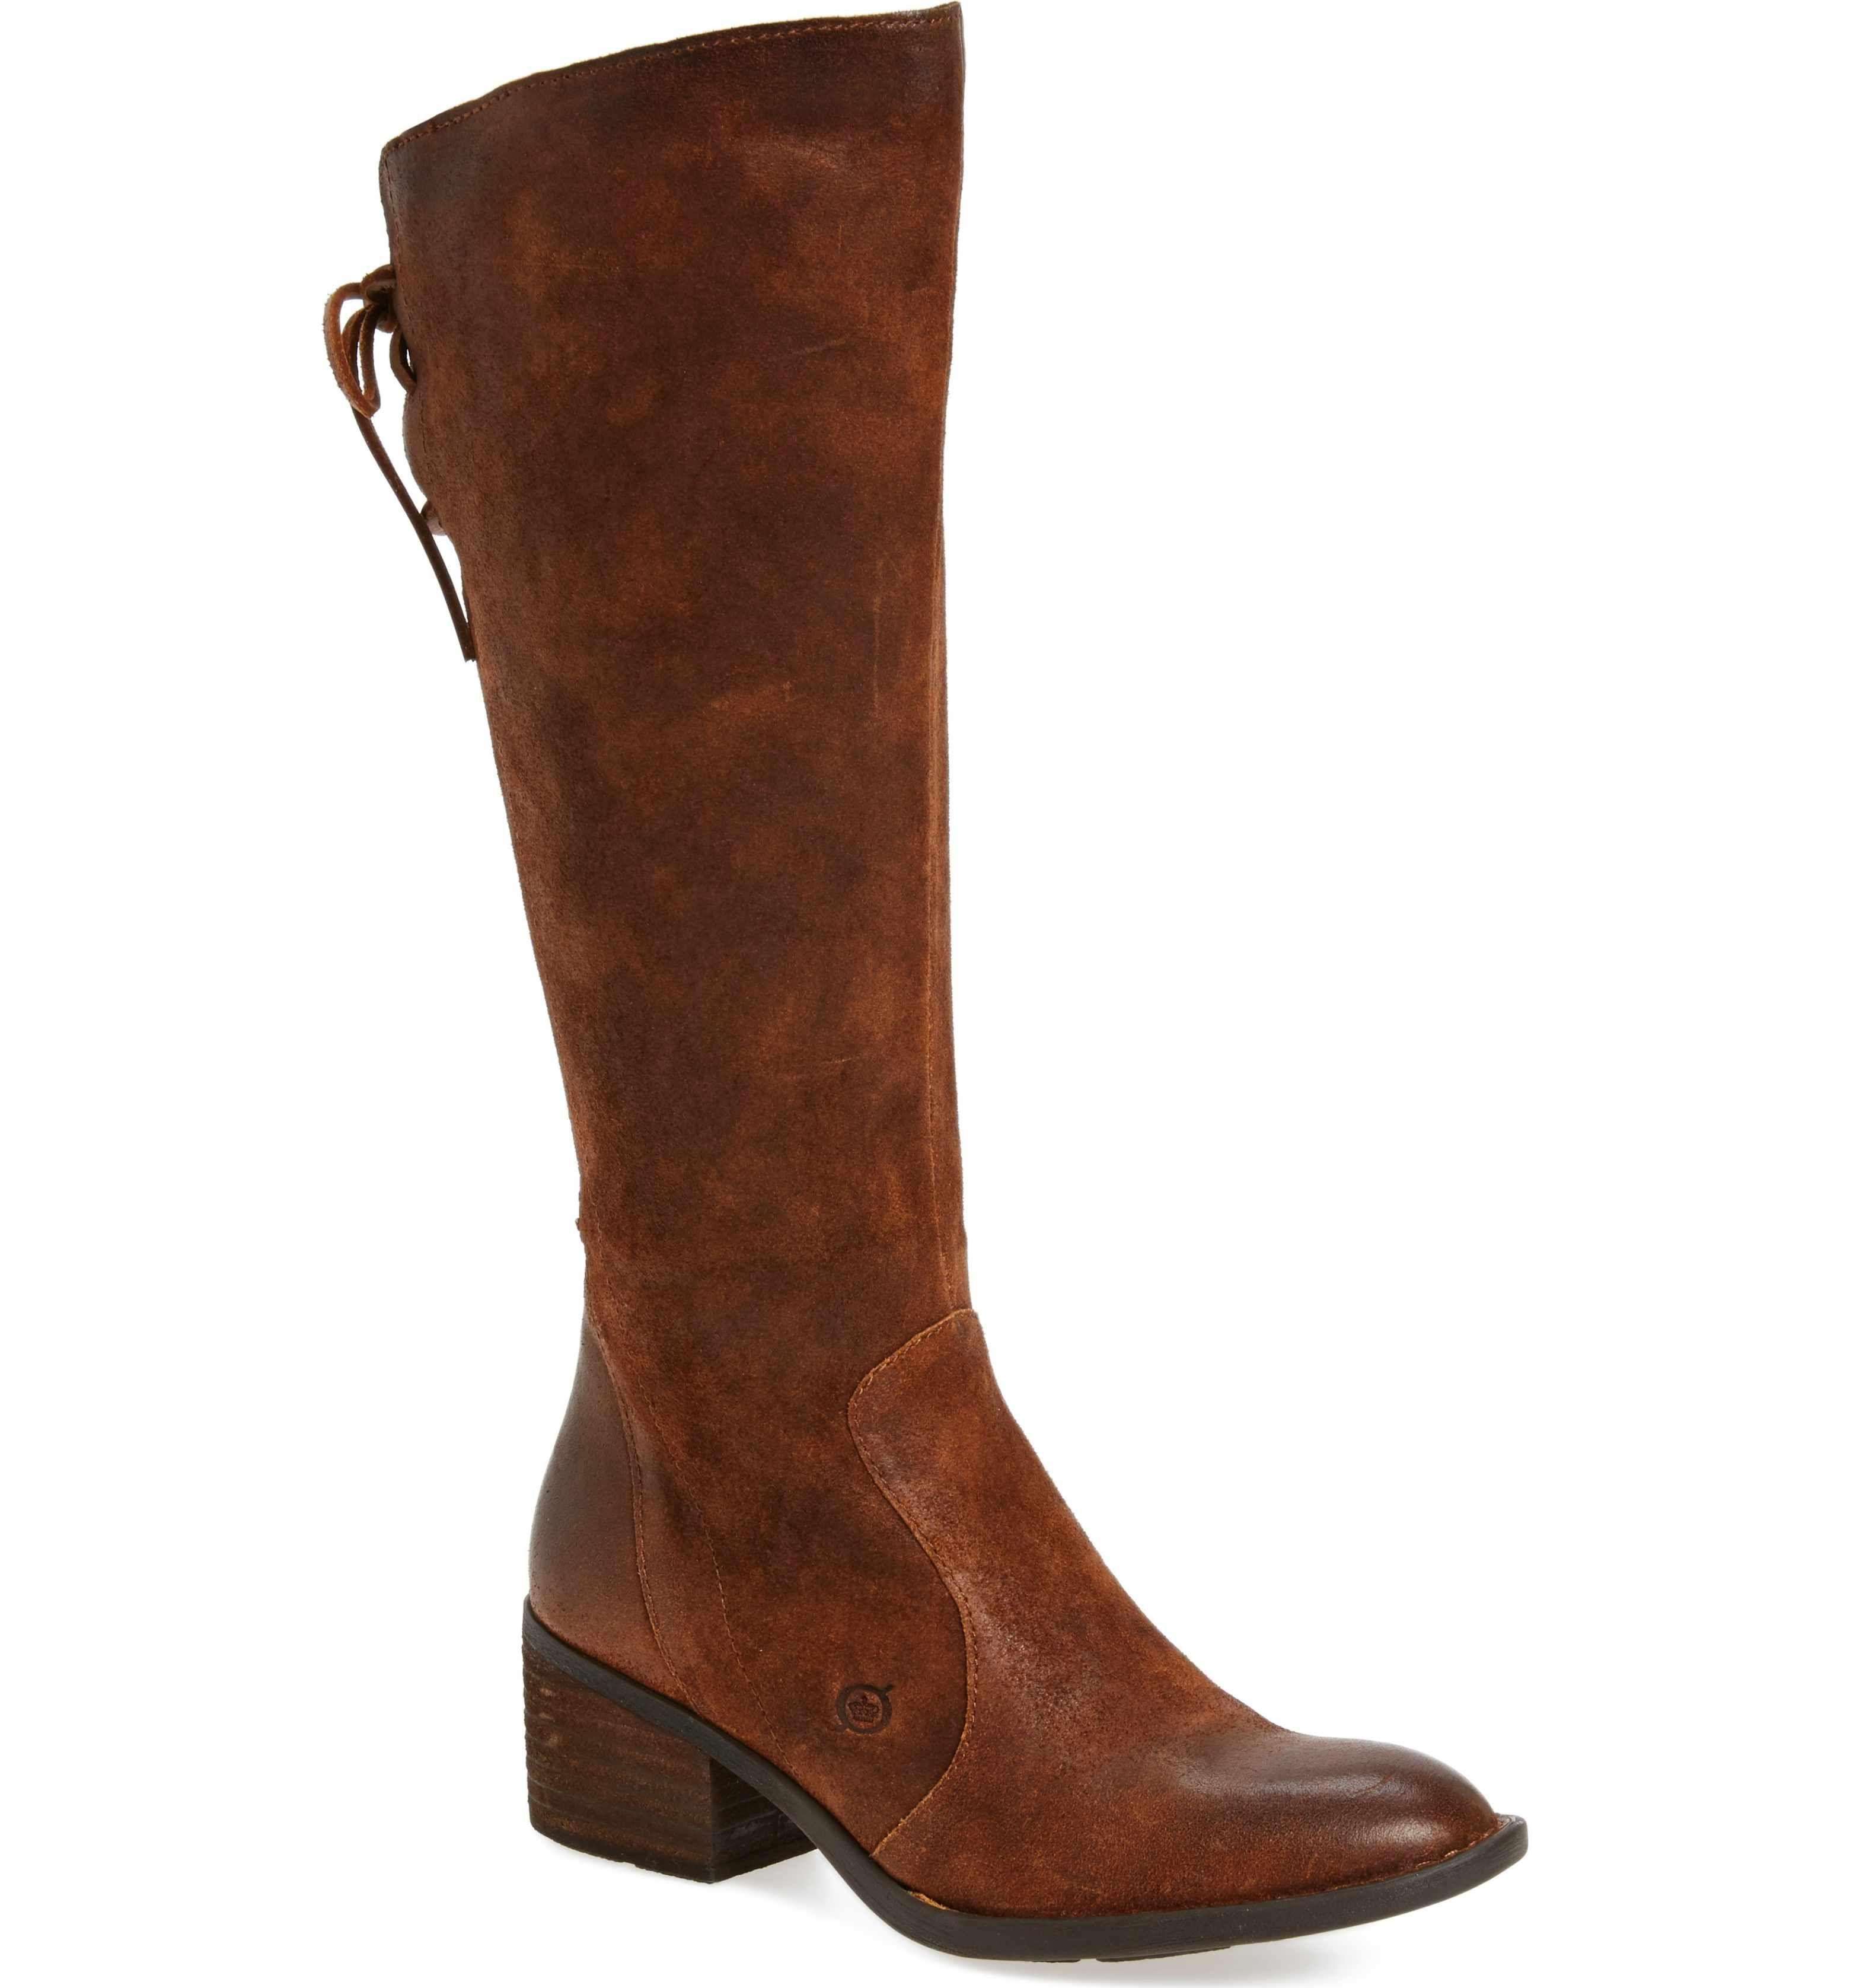 B?rn Felicia Knee High Boot Women Regular & Wide Calf   Nordstrom